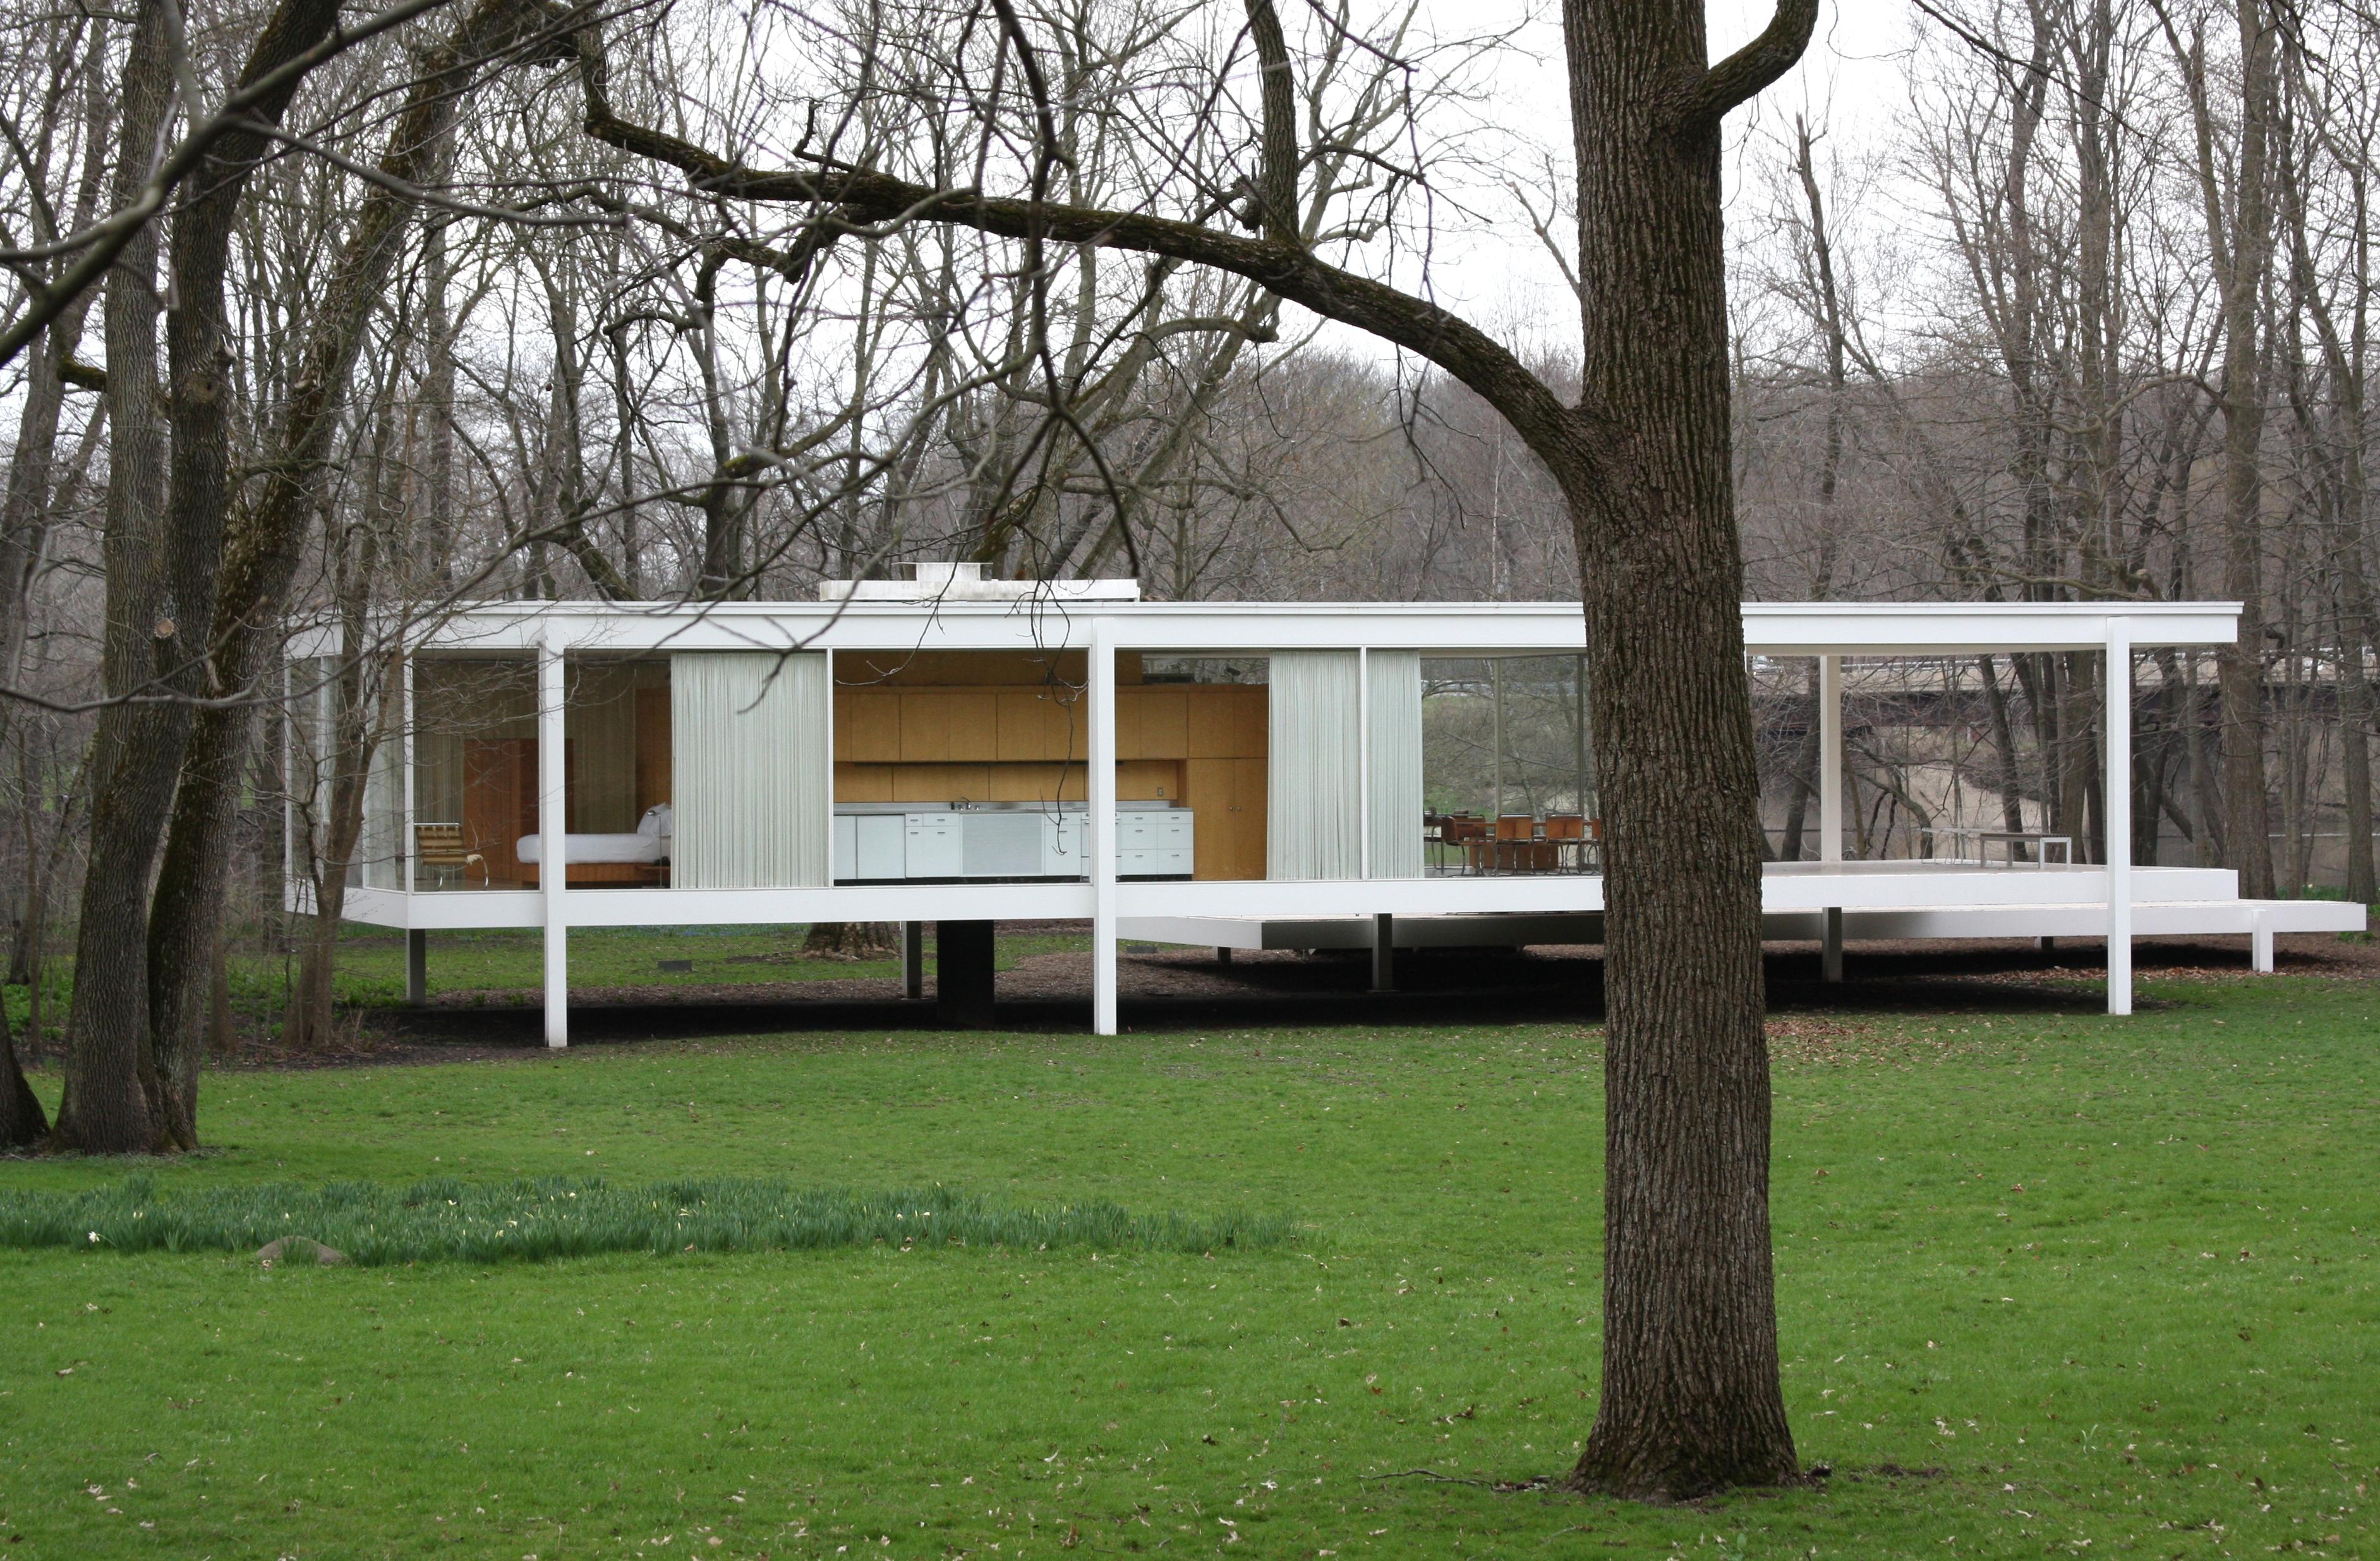 Farnsworth house by mies van der rohe exterior 8 jpg - Farnsworth House By Mies Van Der Rohe Exterior 8 Jpg 32